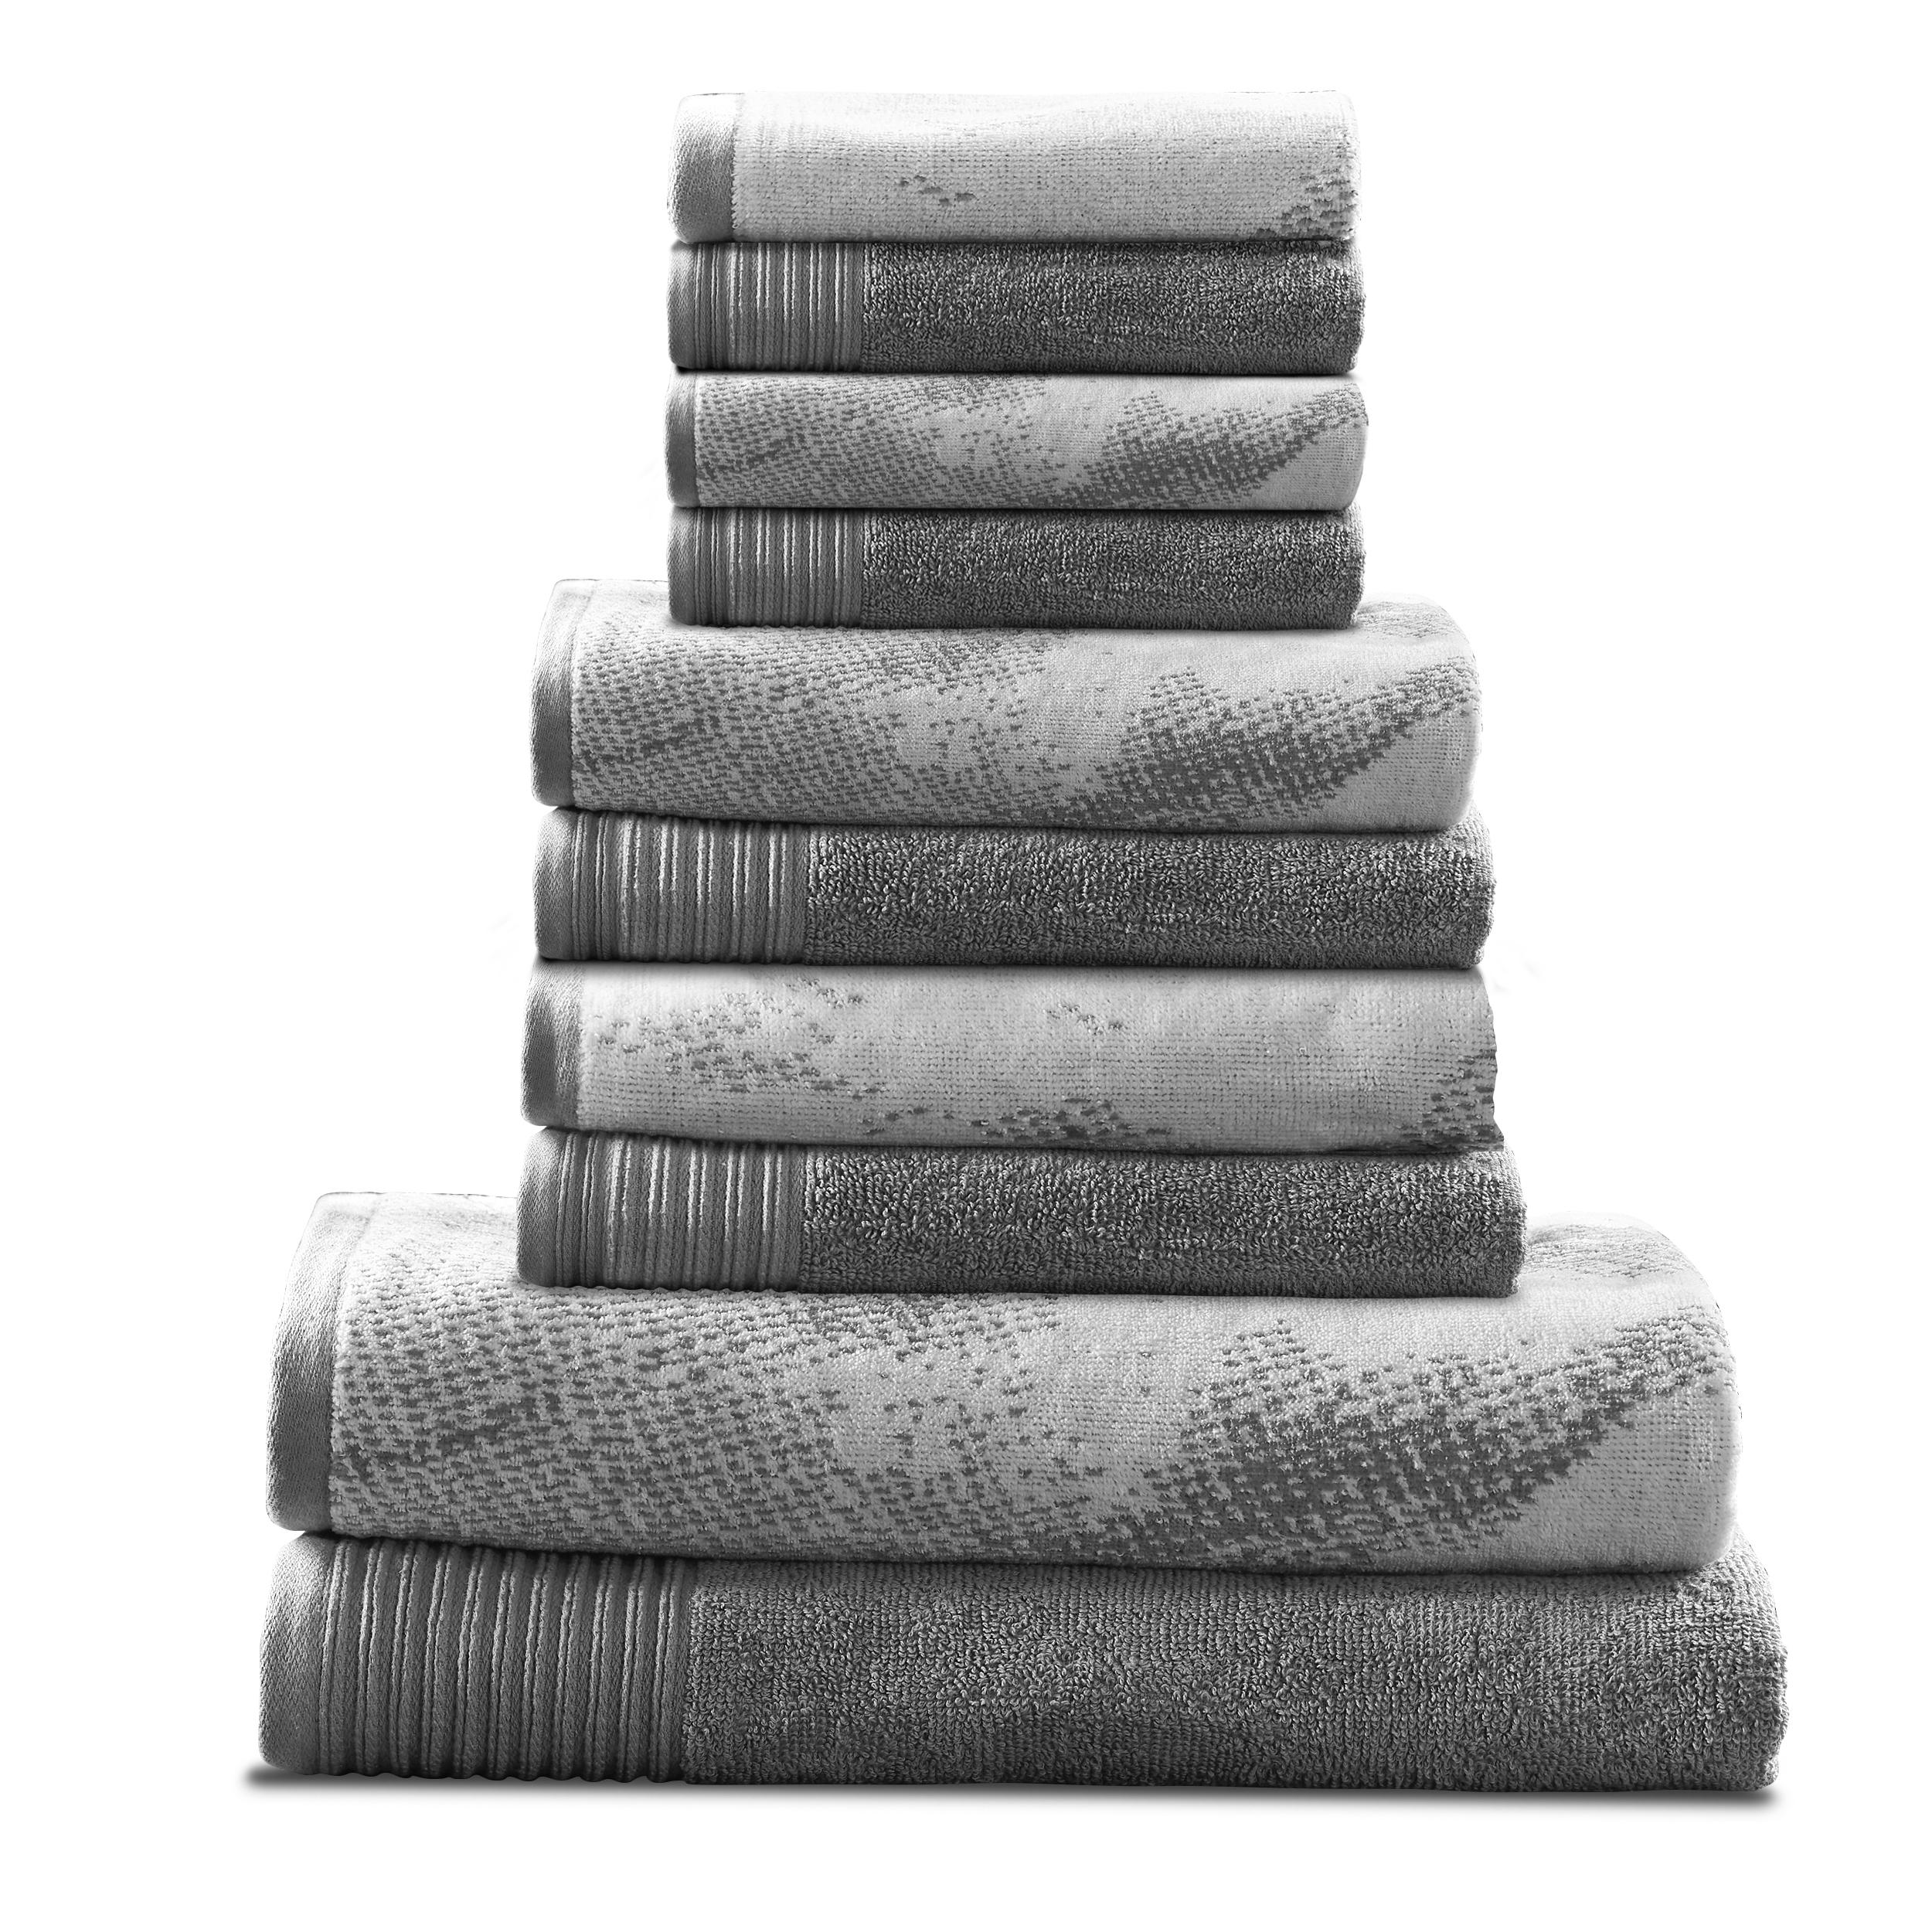 Marble Effect 500 GSM 10-Pieces Albatross 100/% Combed Cotton Towel Set